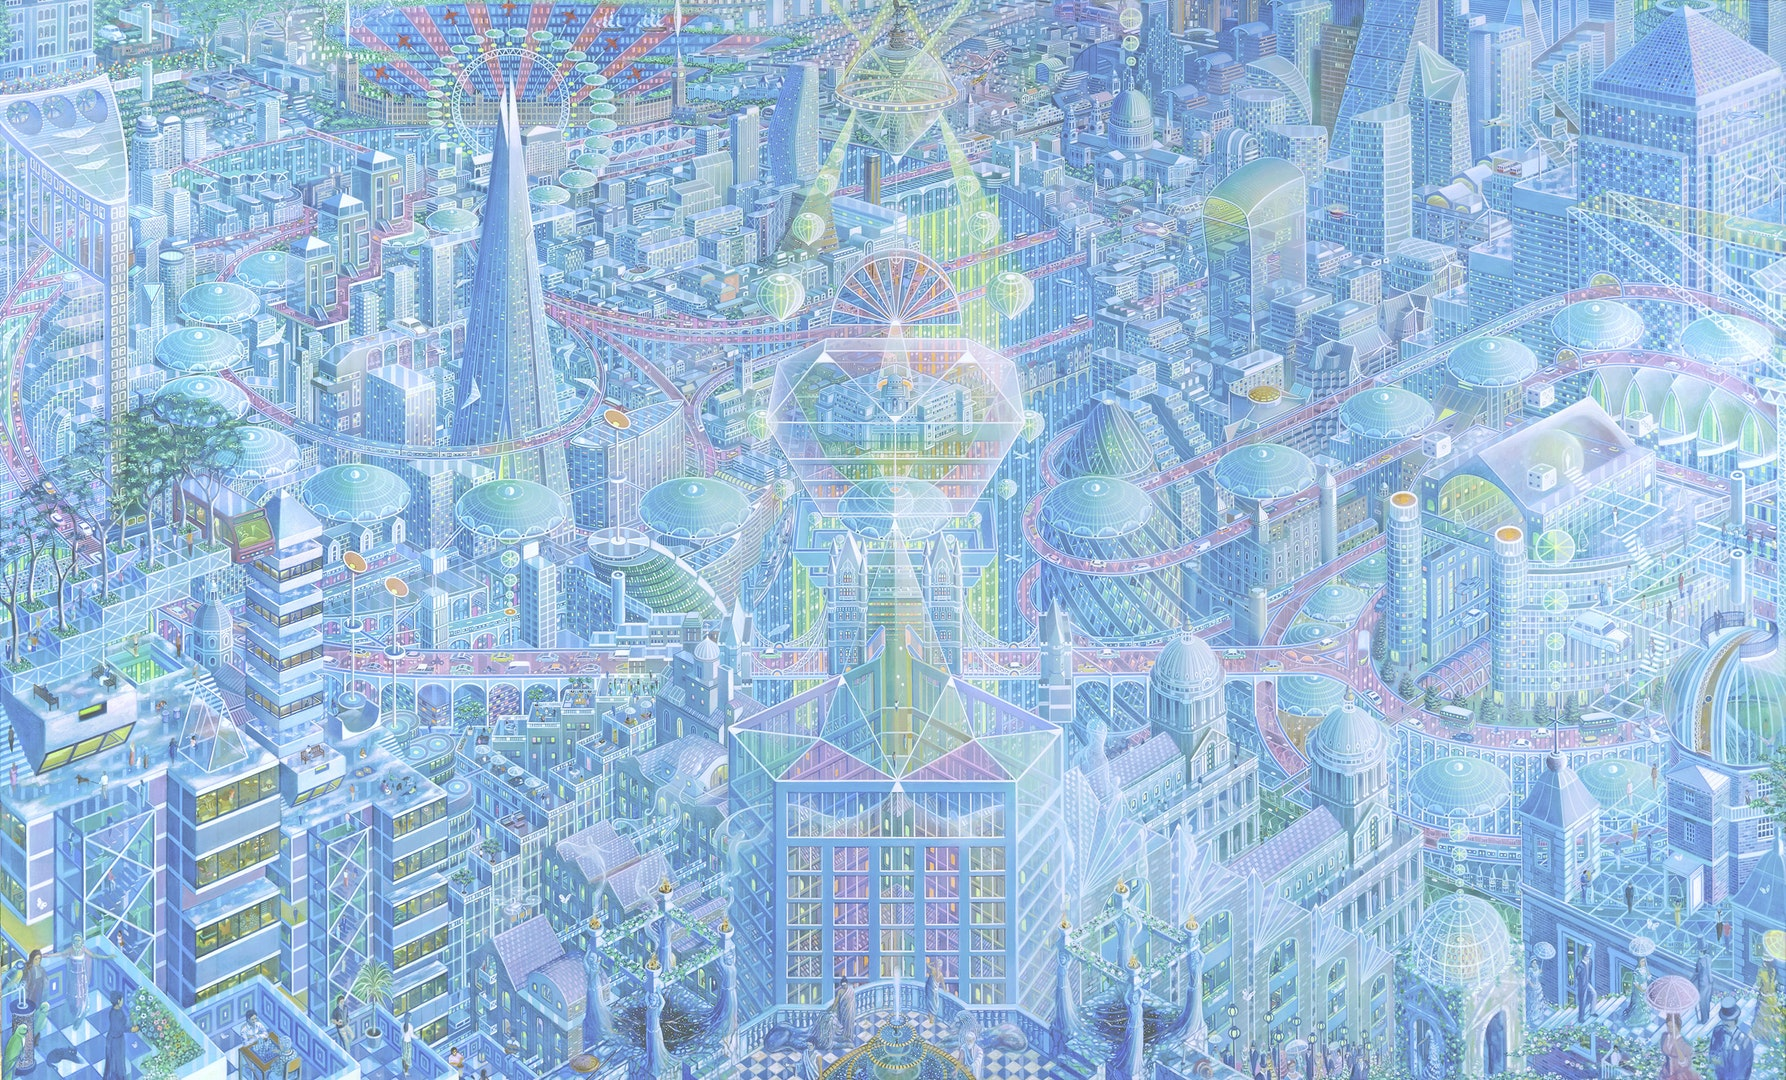 Caio Locke - Metropolis London